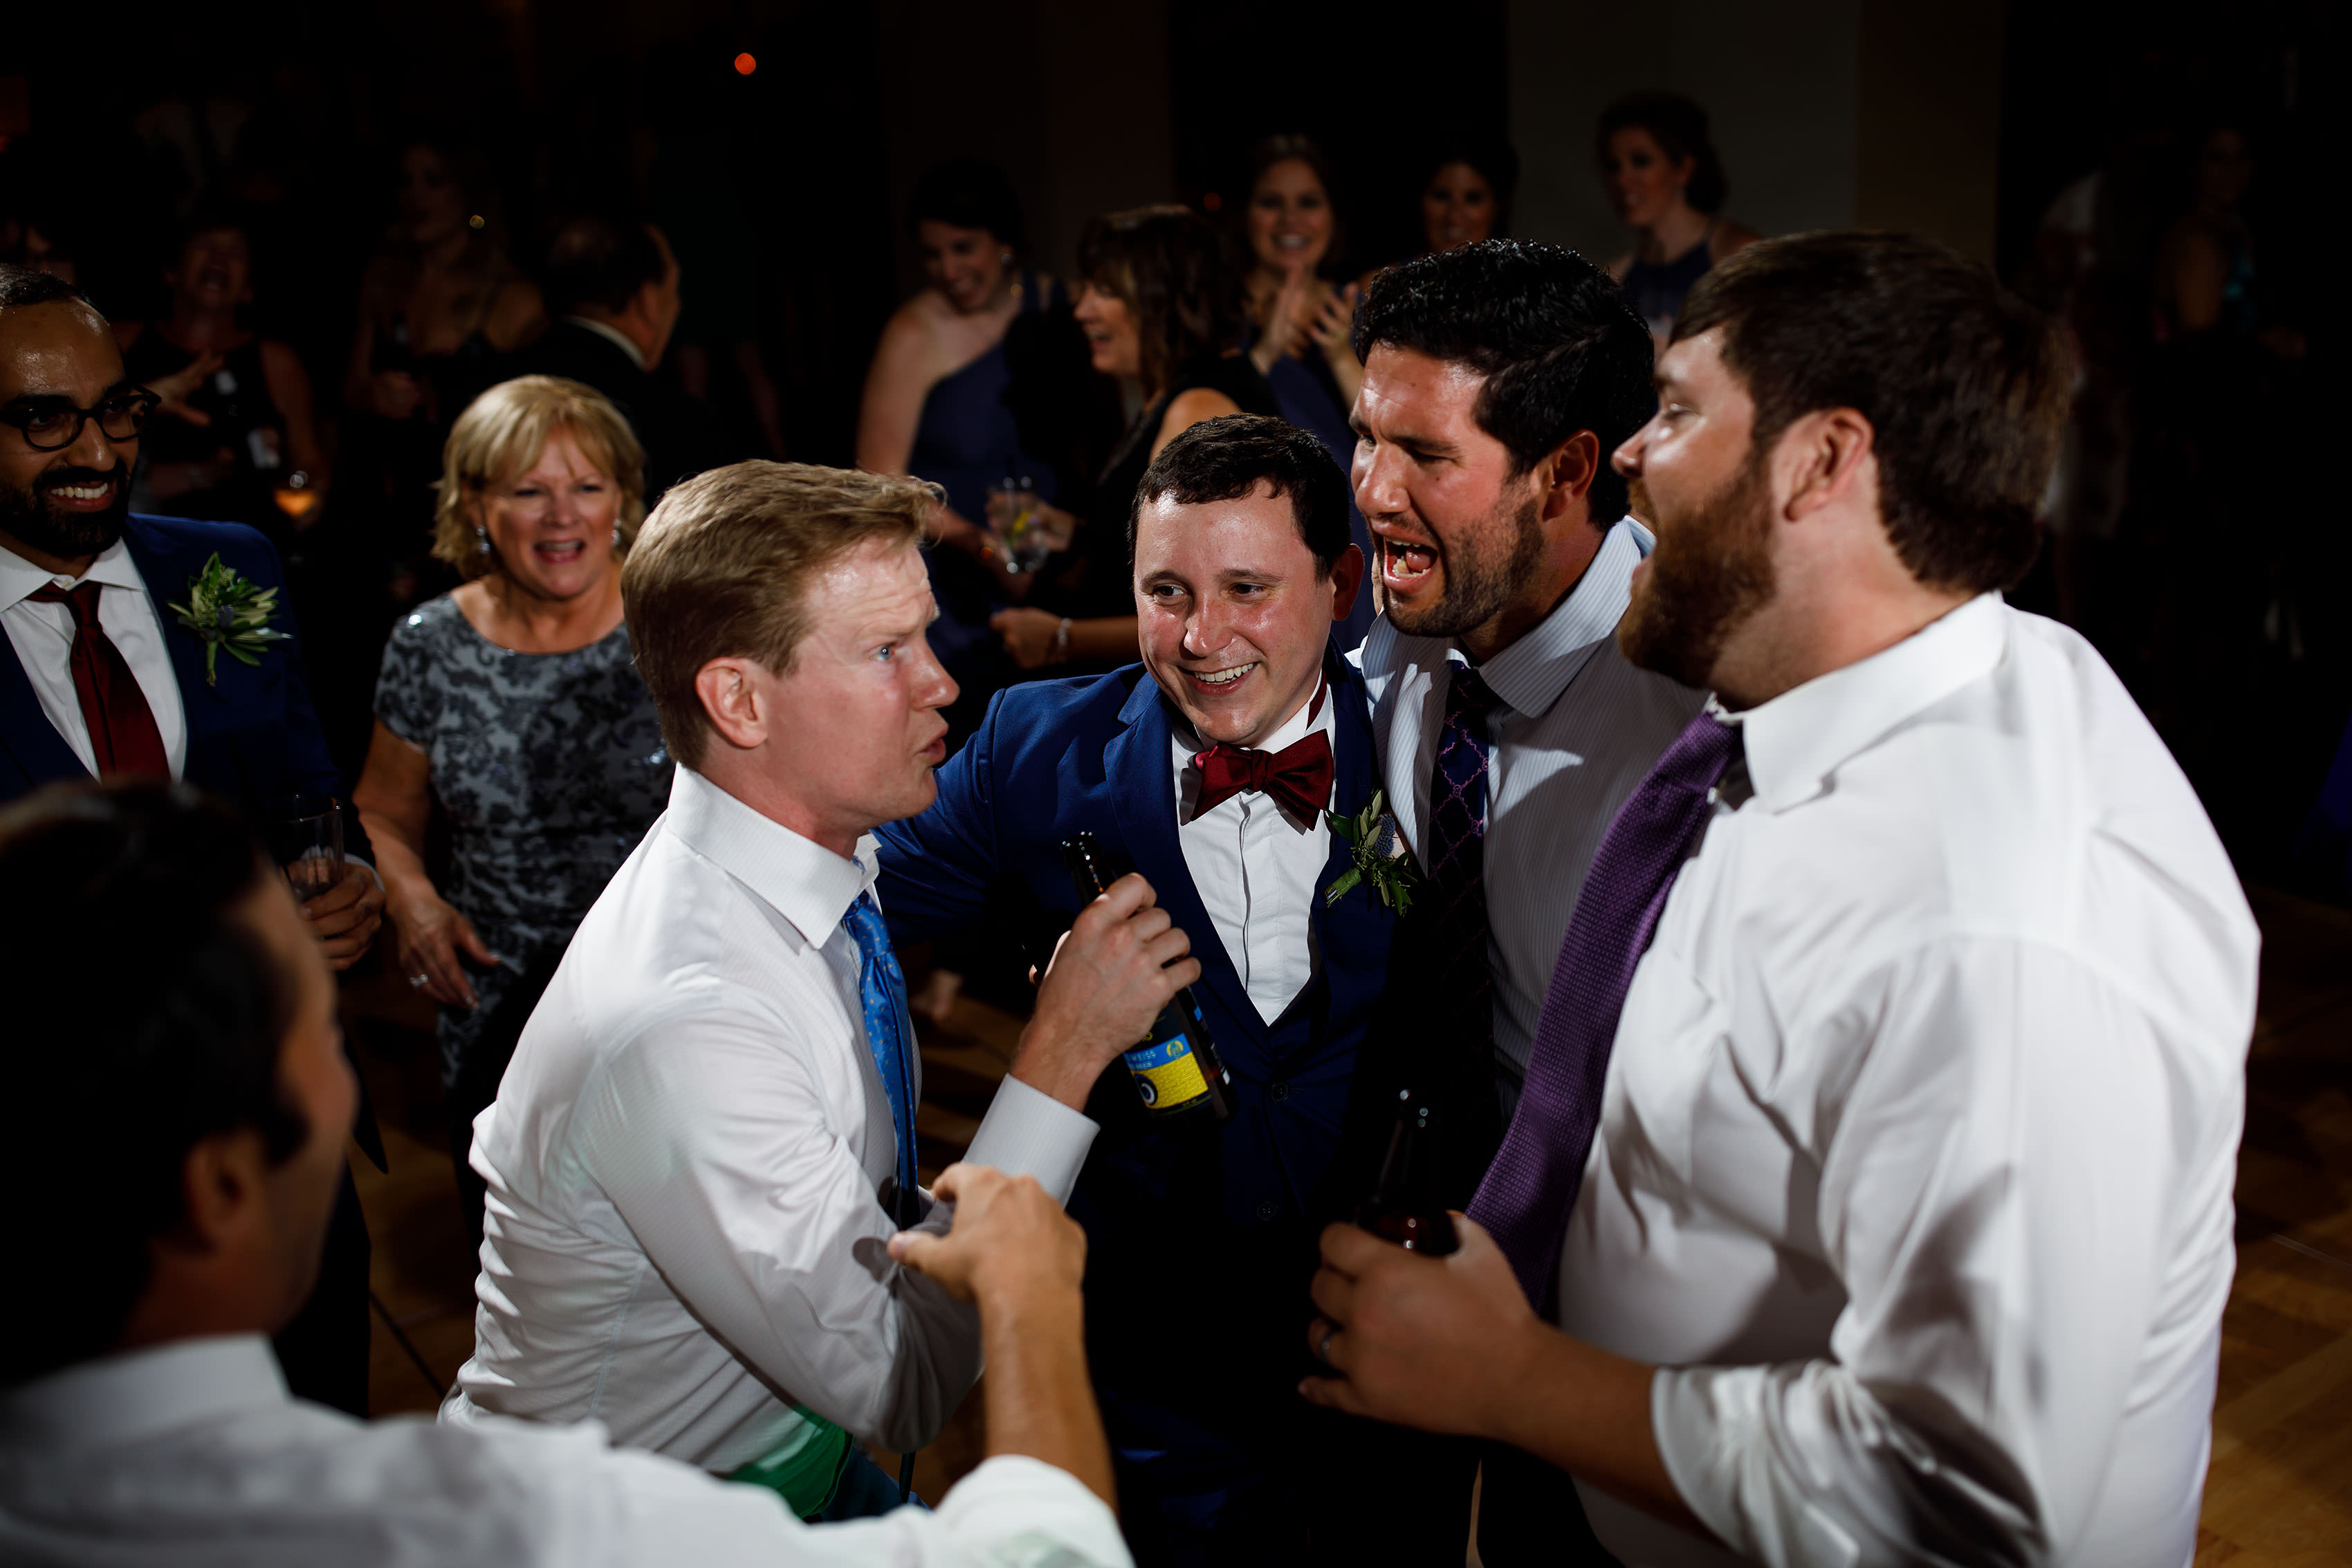 Guests dance at Katie and Joel wedding